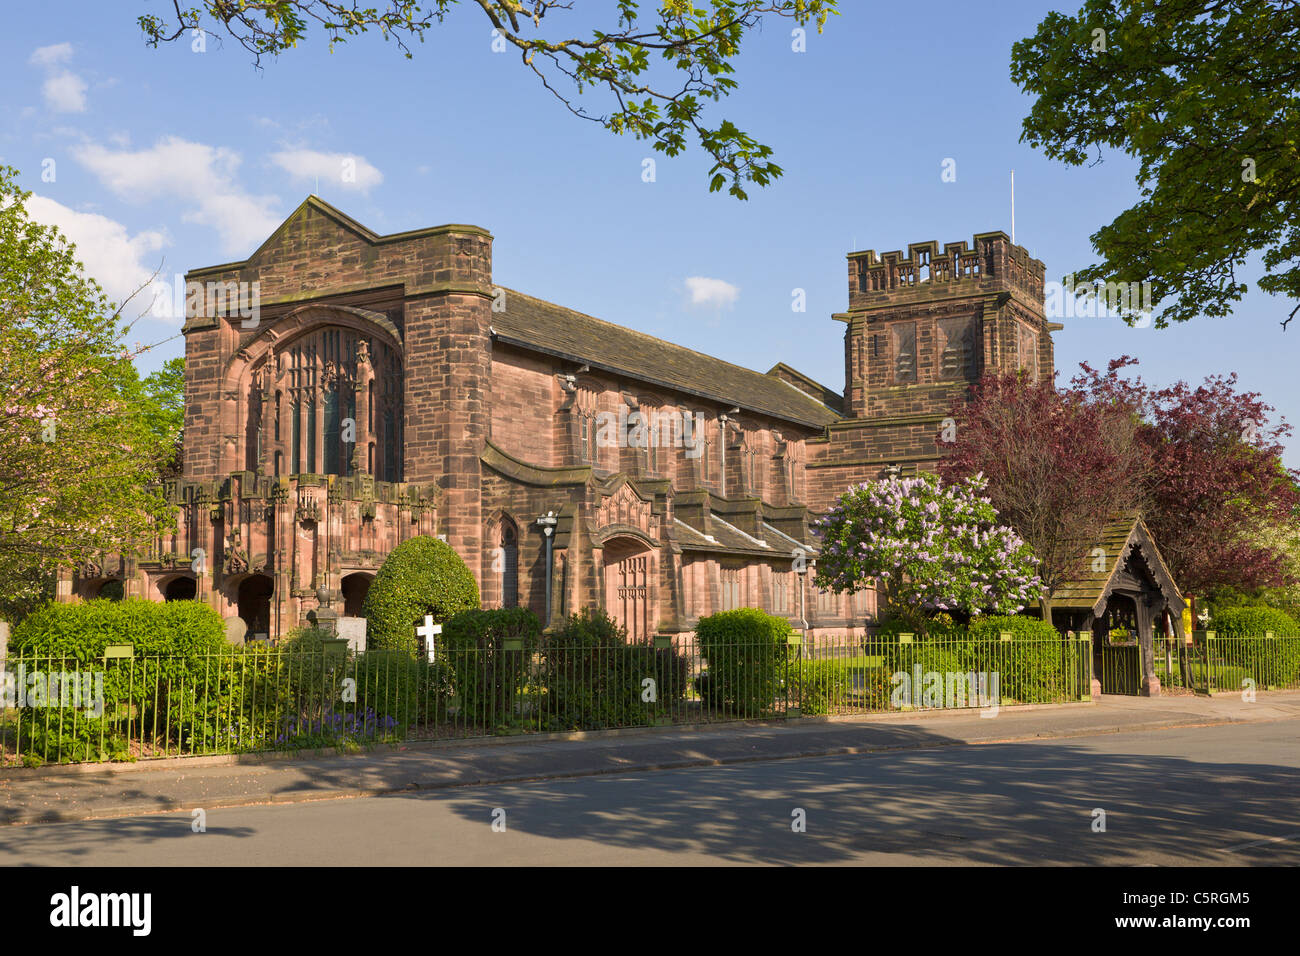 Christ Church, Port Sunlight, Wirral, England - Stock Image